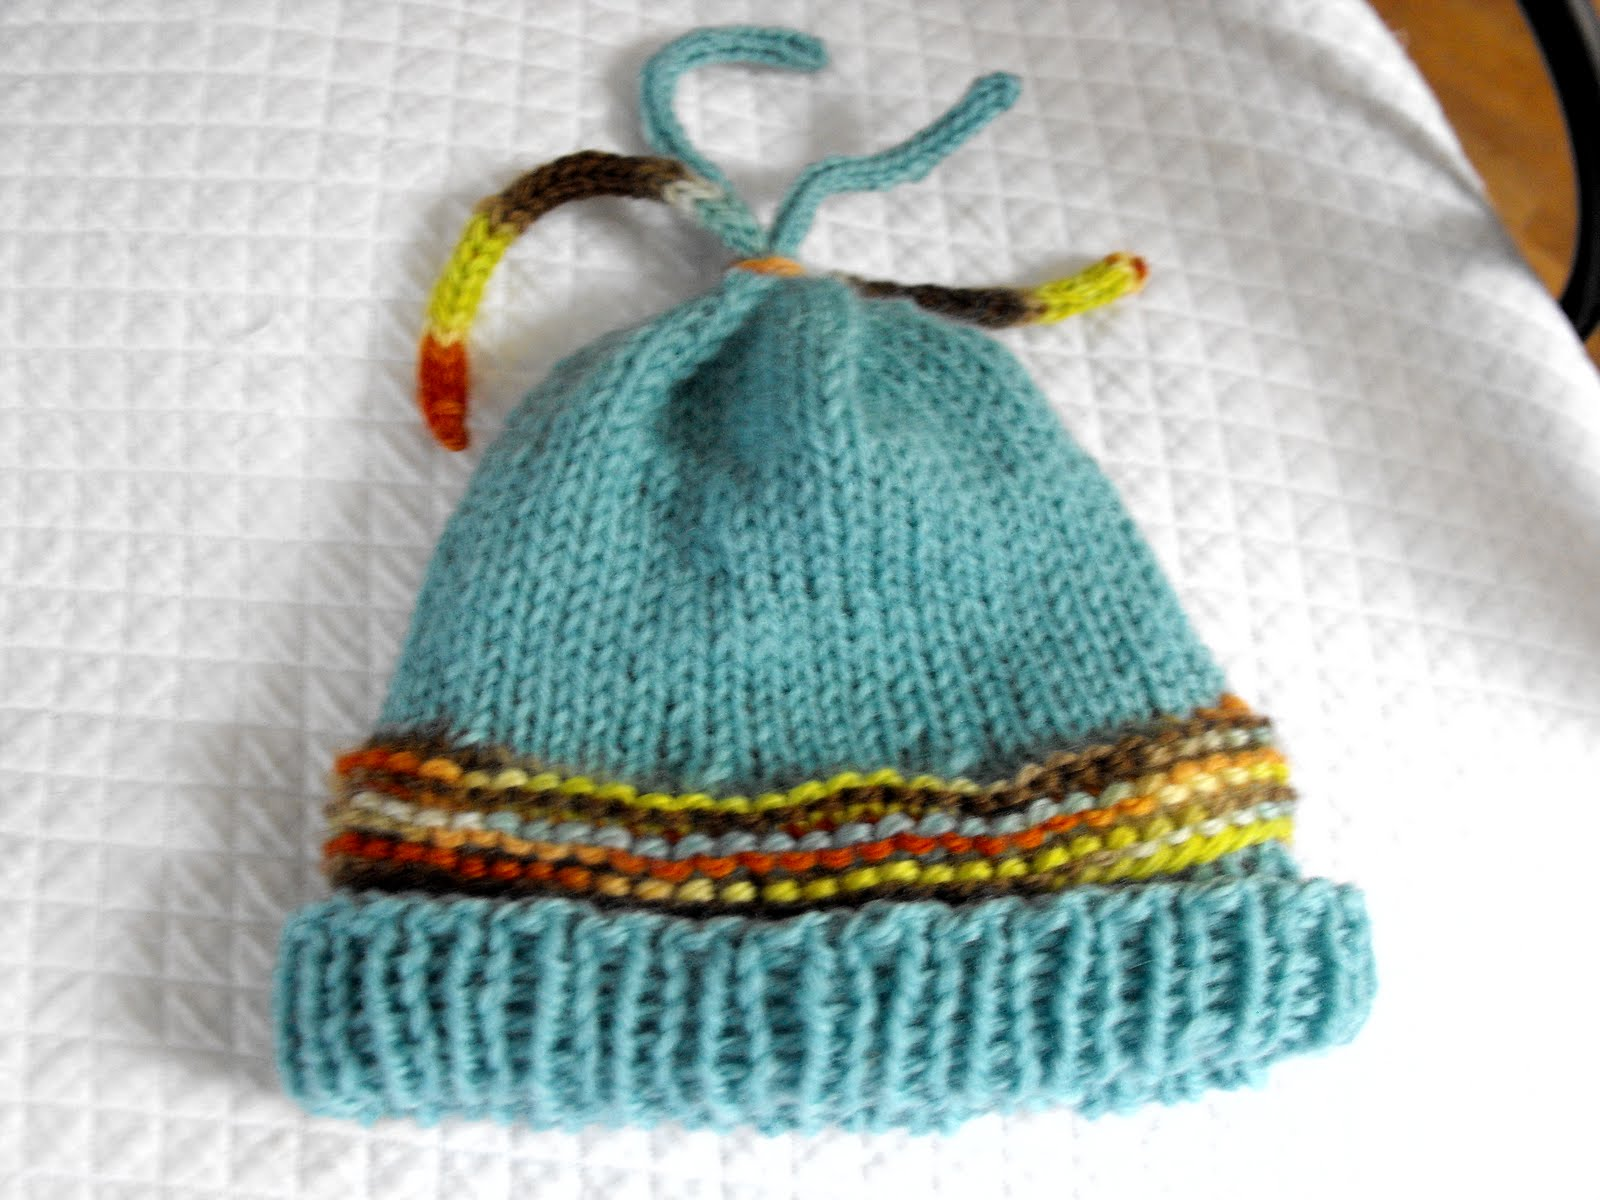 Knitting Pattern Umbilical Cord Hat : Knitting Amy: I-cord tasseled hat